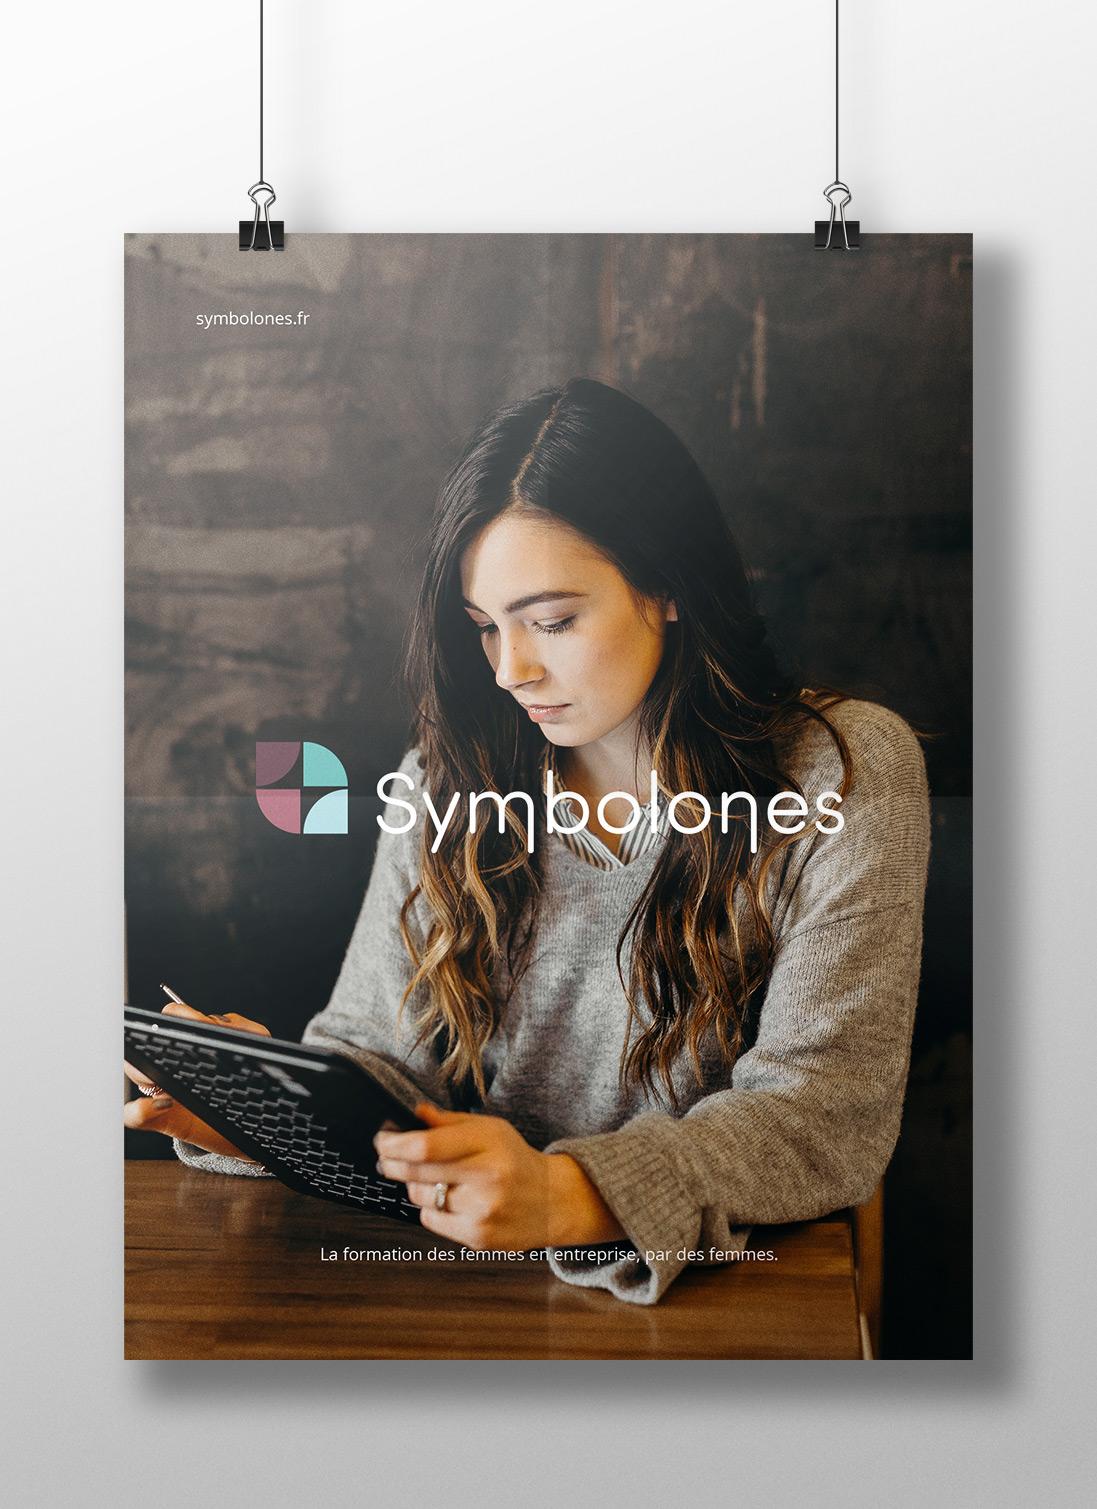 https://isse-ari-design.fr/wp-content/uploads/2020/08/poster-symbolones-2.jpg